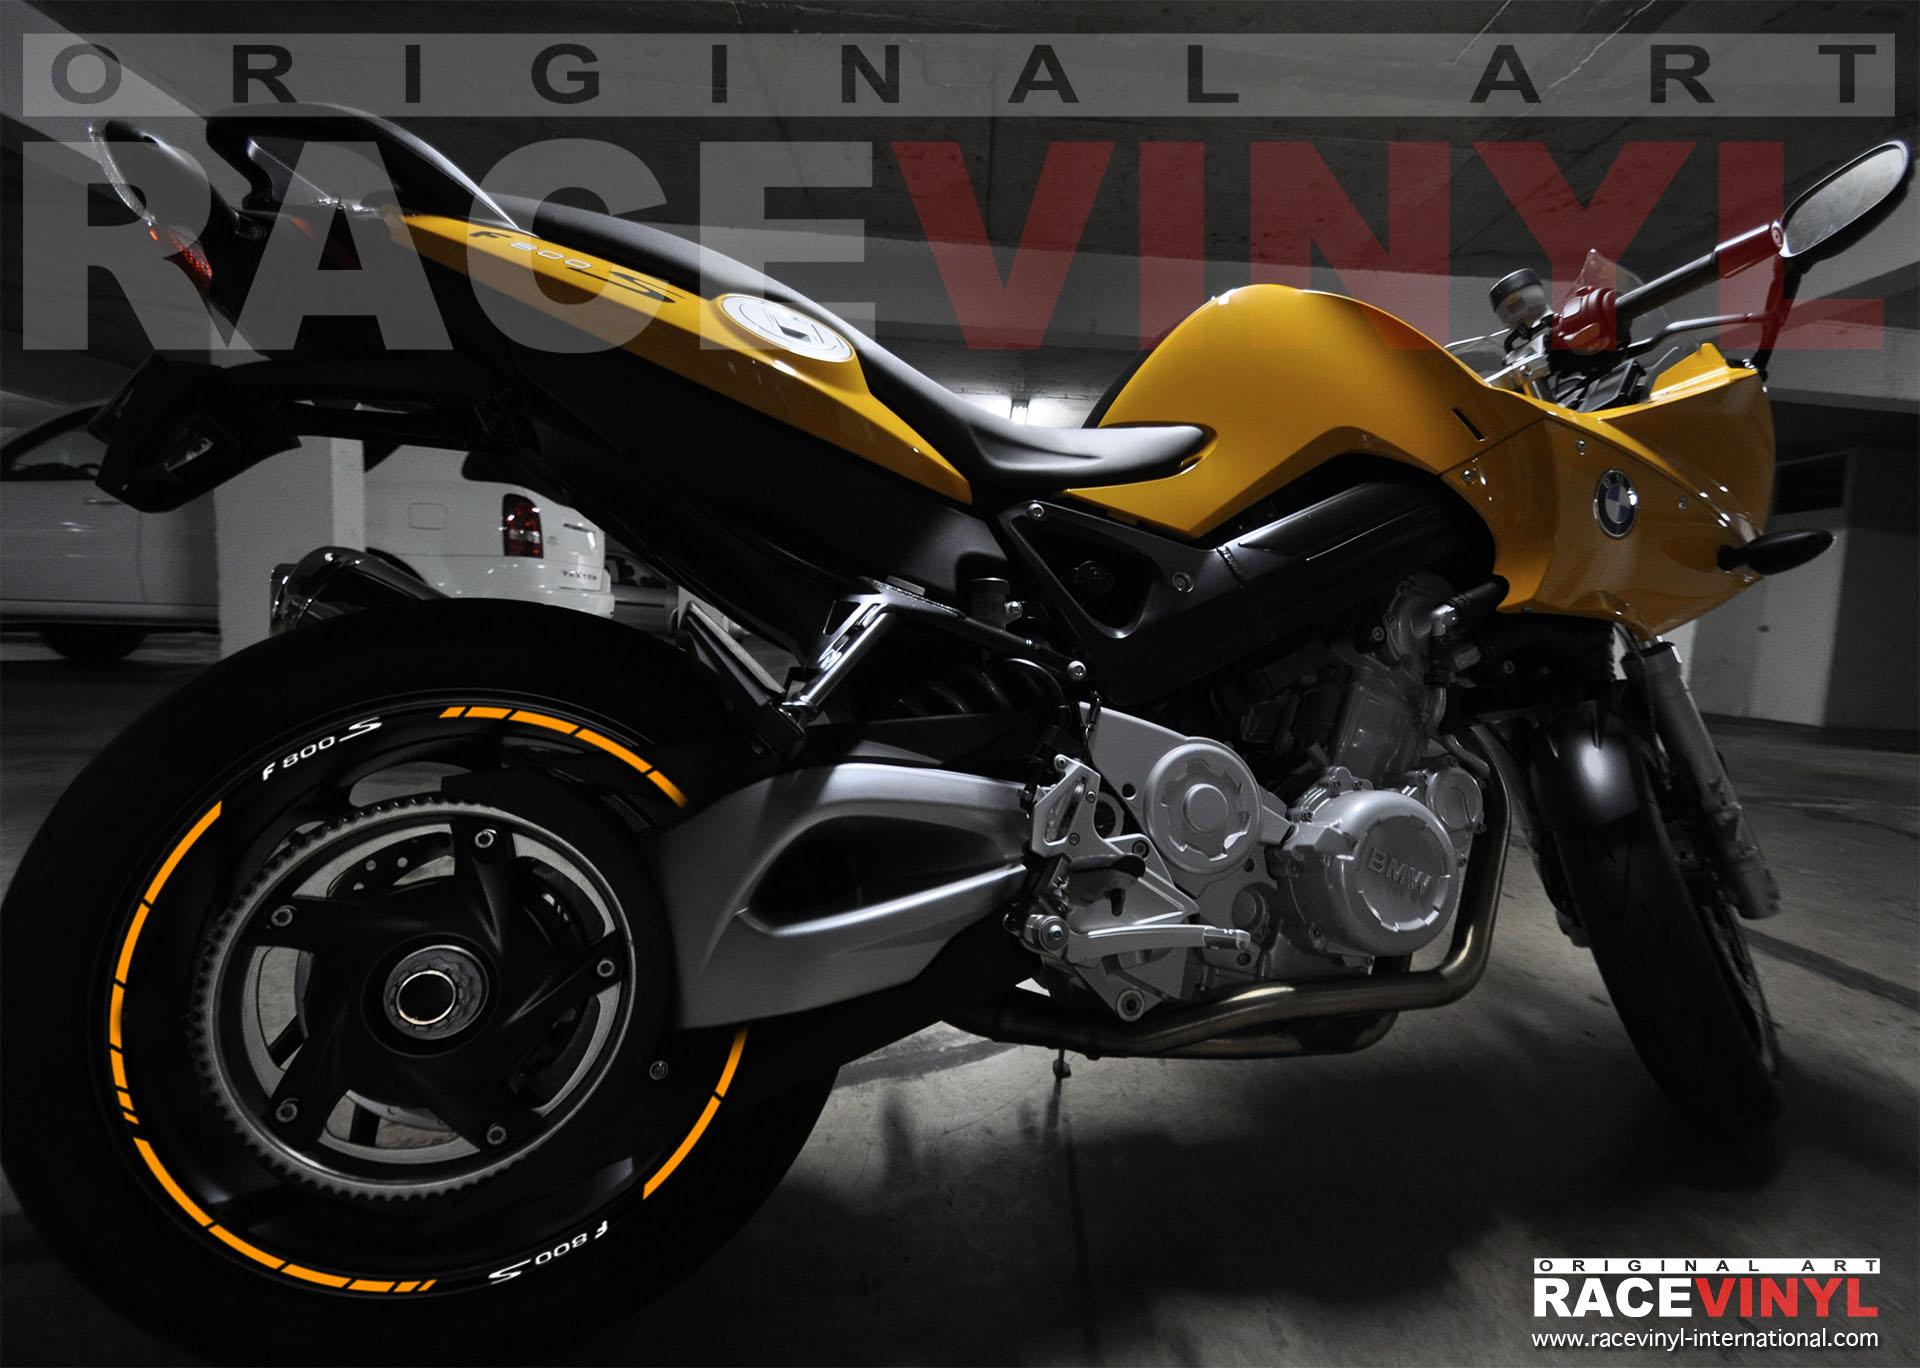 Wallpaper-BMW-F-800-S-F800S-adhesivo-pegatina-vinilo-llanta-rueda-moto-sticker-vinyl-rim-stripe-copia.jpg